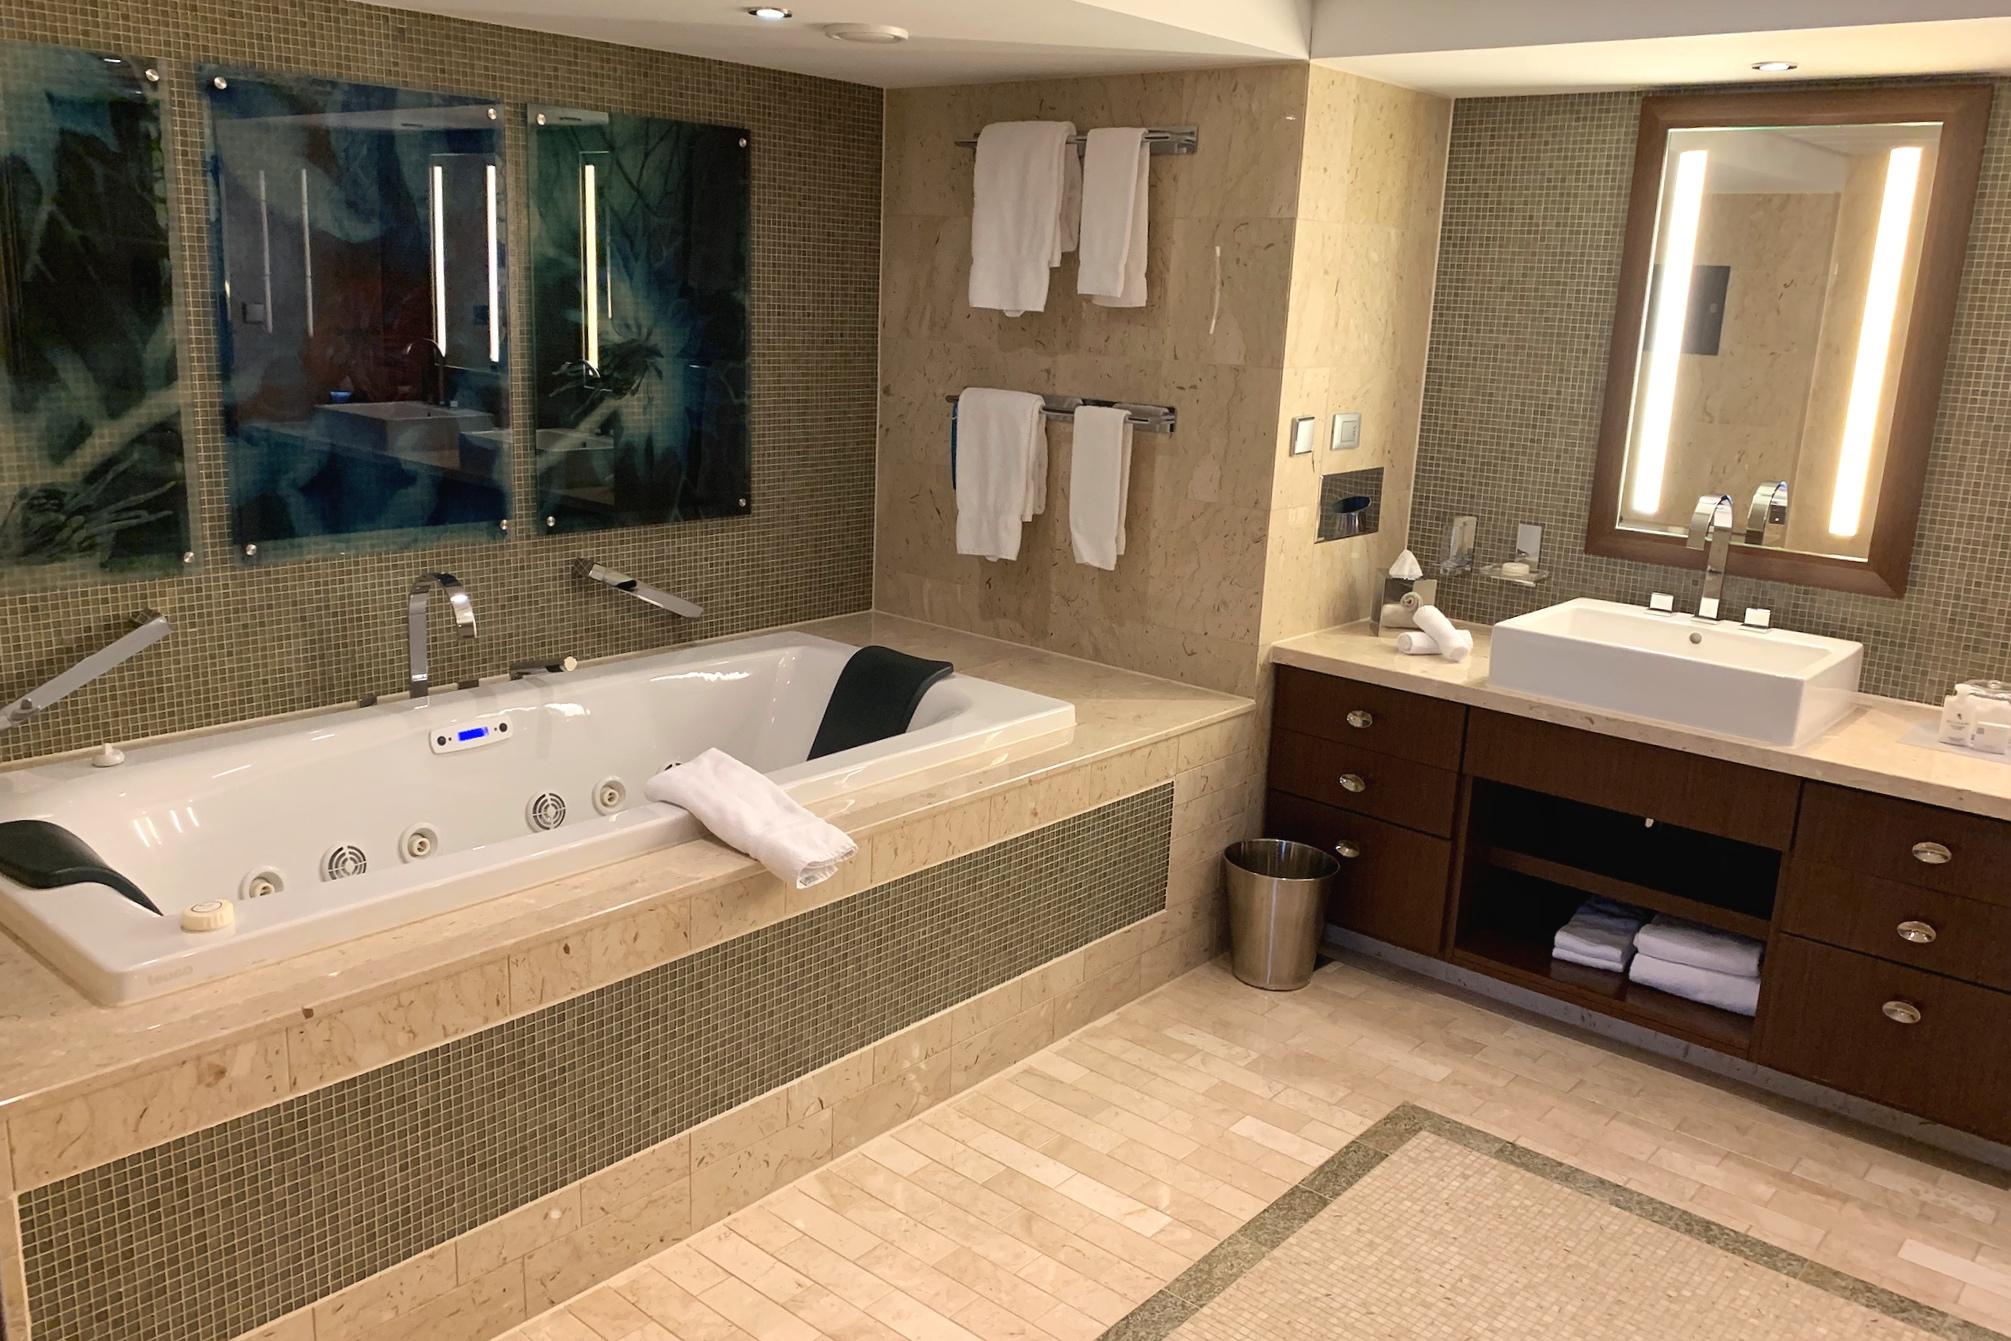 The massive bathroom